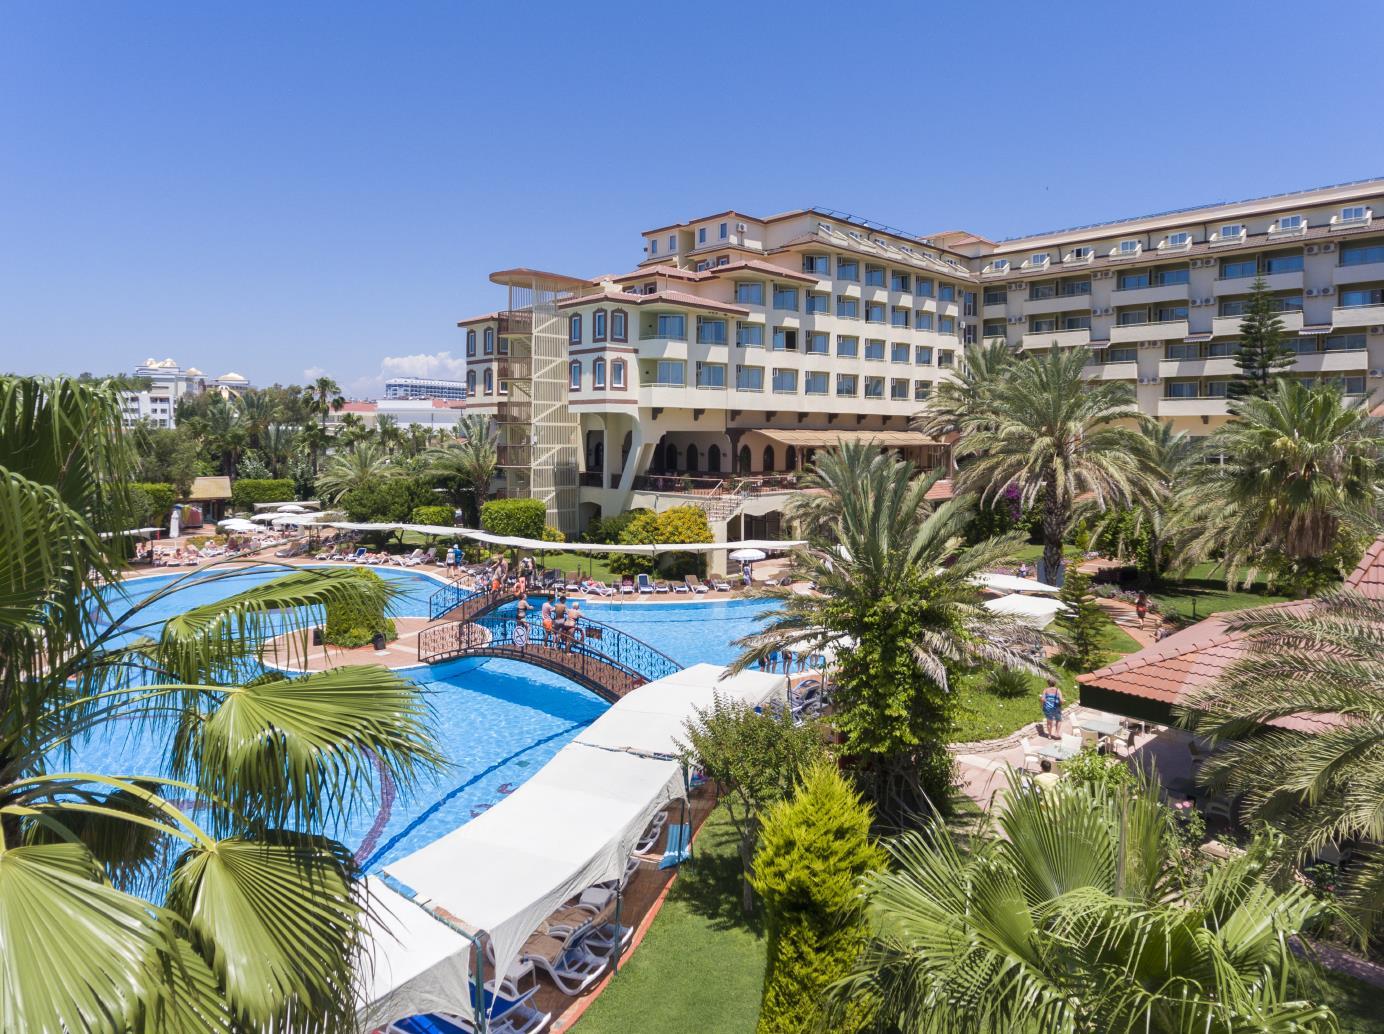 http://www.orextravel.sk/OREX/hotelphotos/nova-park-hotel-general-0010.jpg